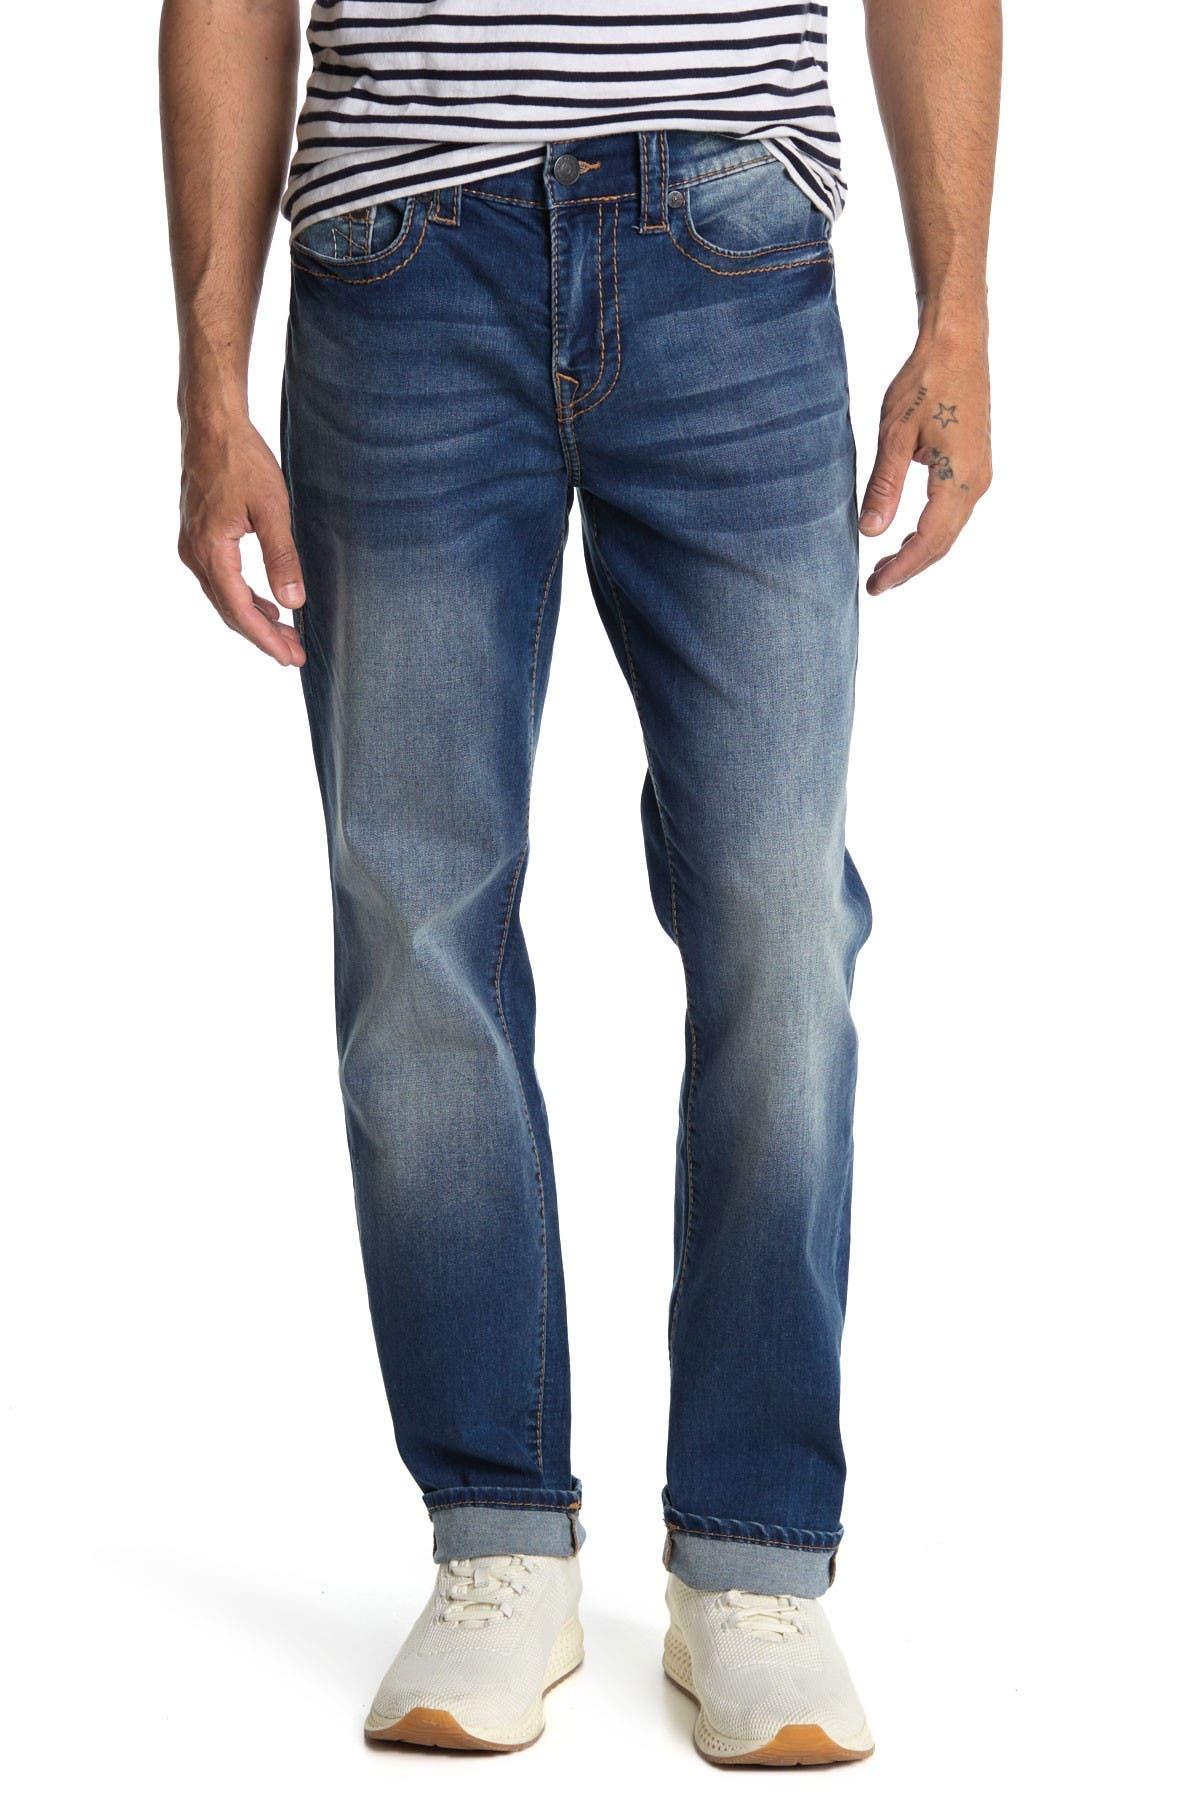 Image of True Religion Geno Big T Flap Jeans